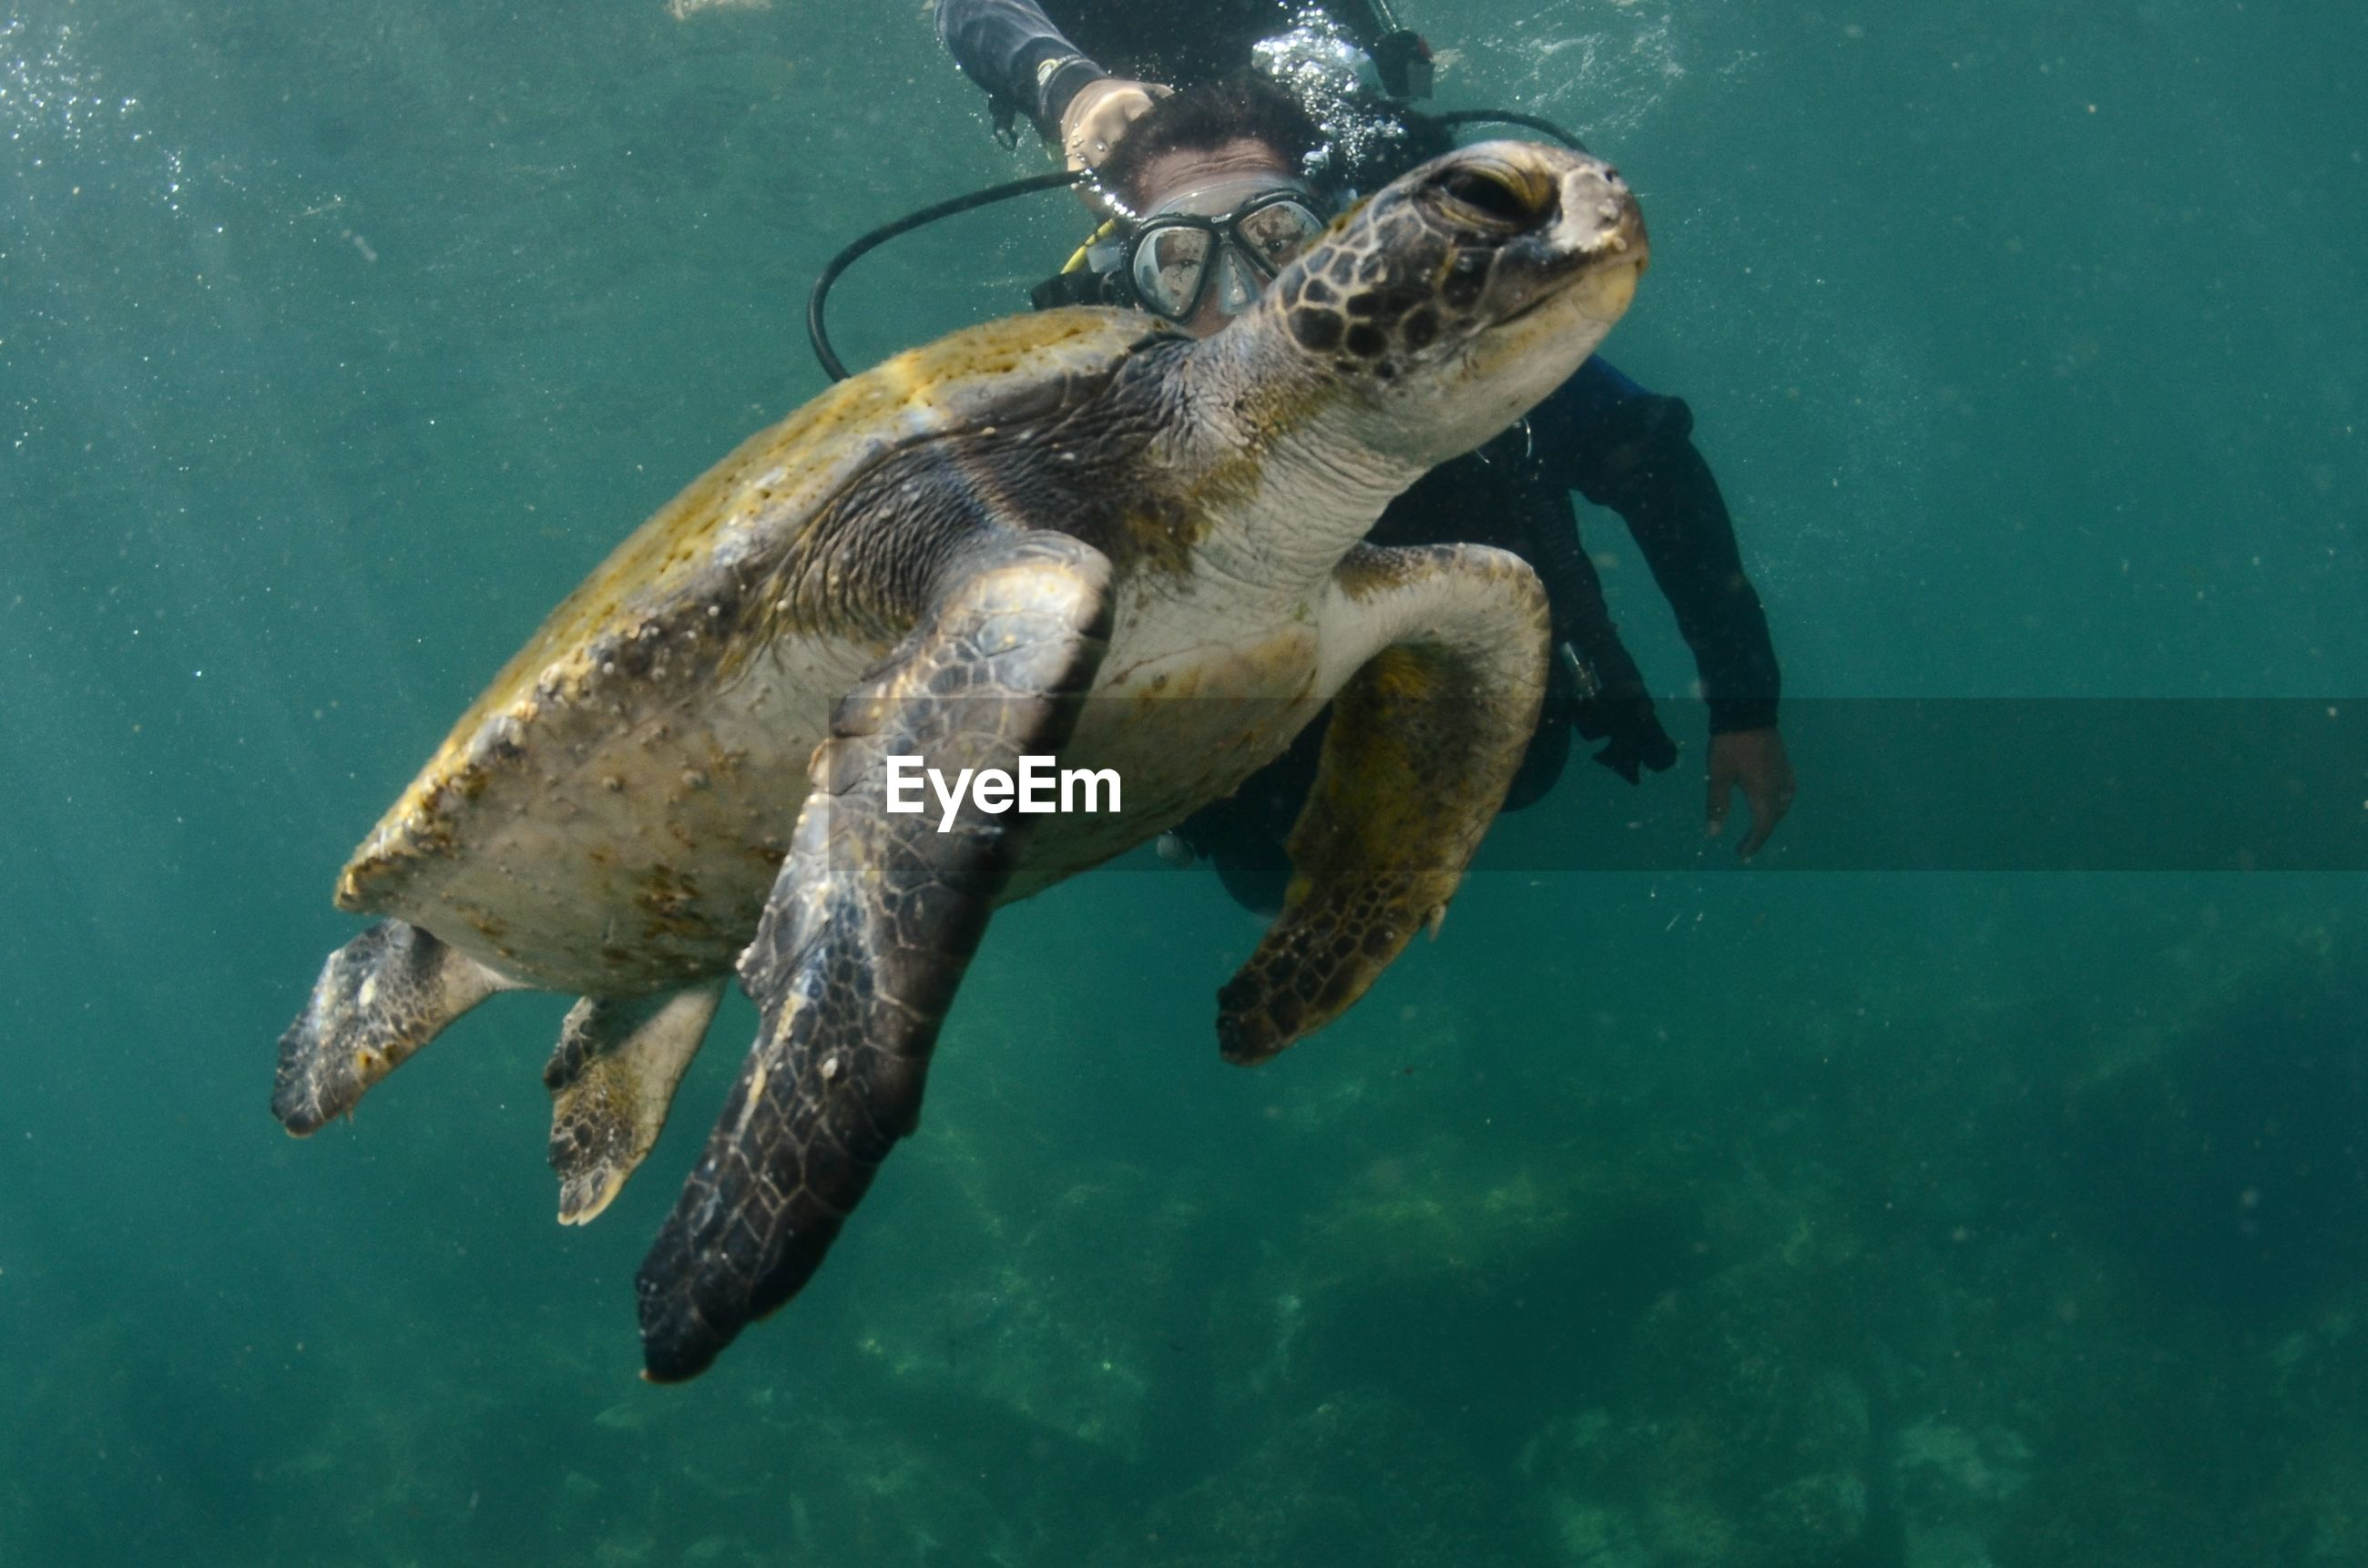 Person scuba diving by turtle in sea